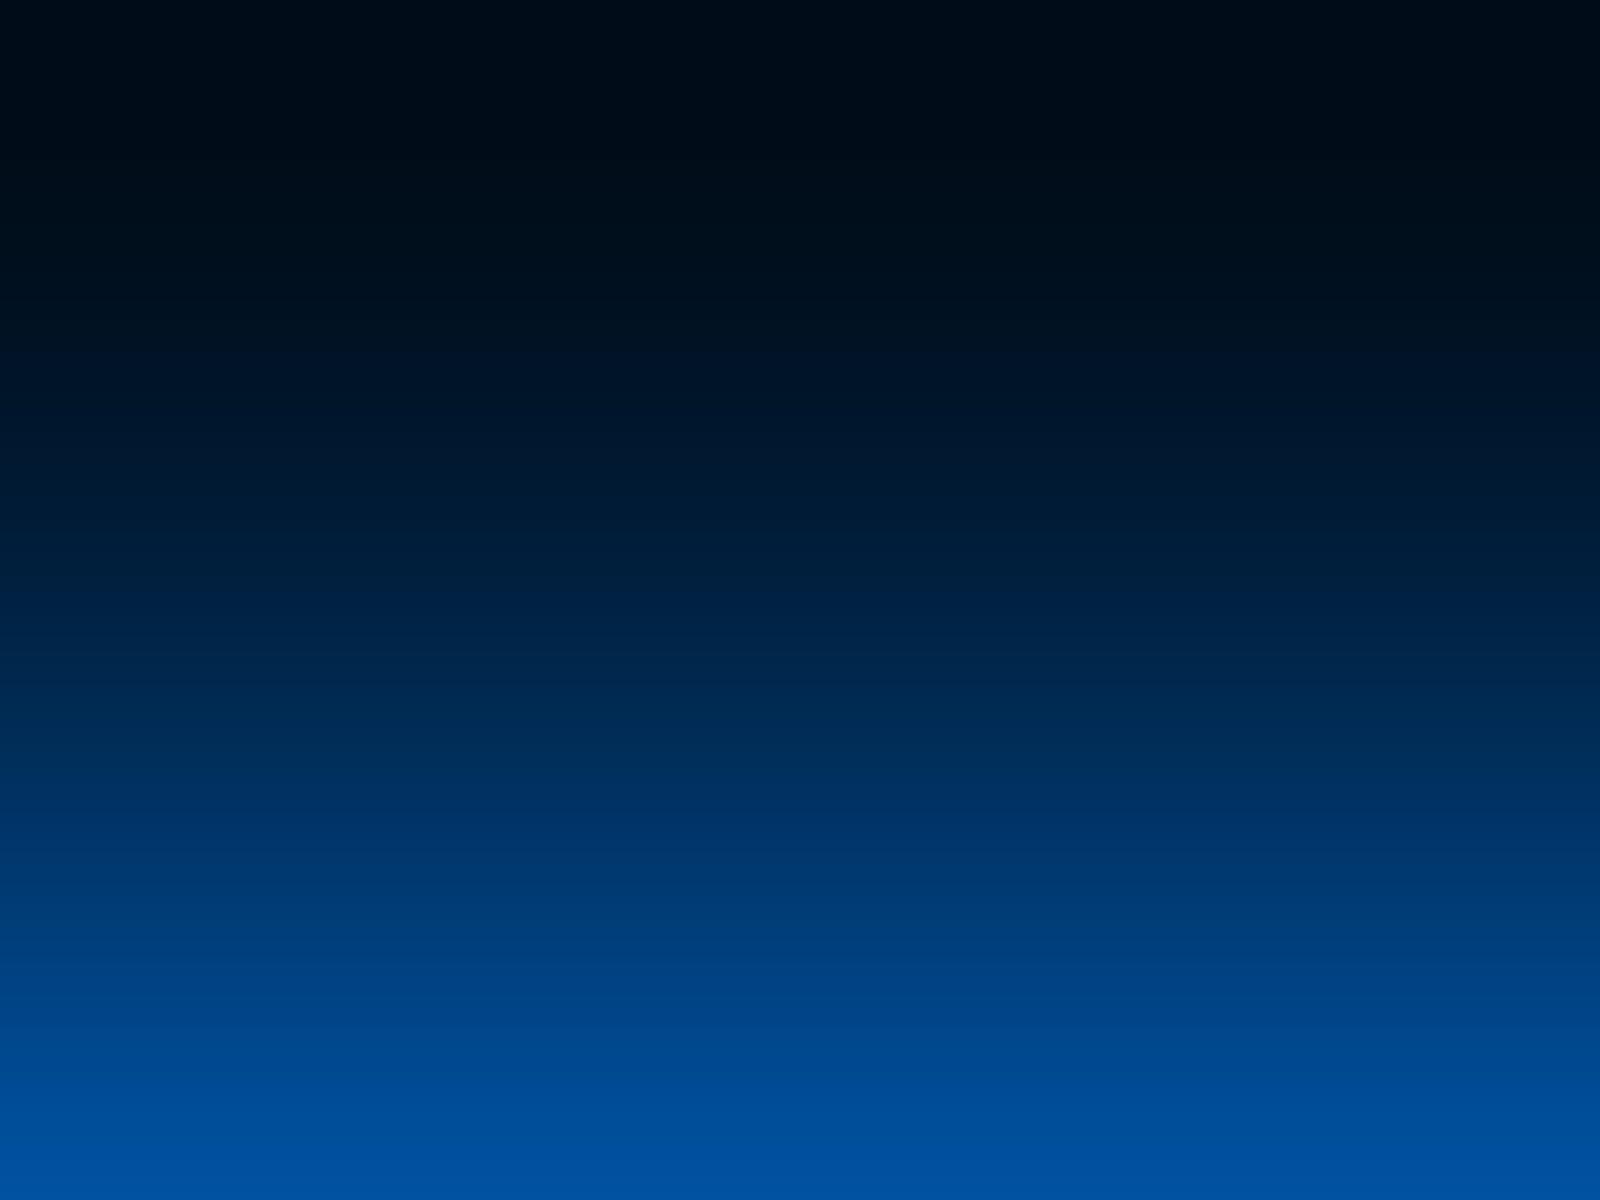 dark-blue-gradient-wallpaper-3 | arcus technology, inc.